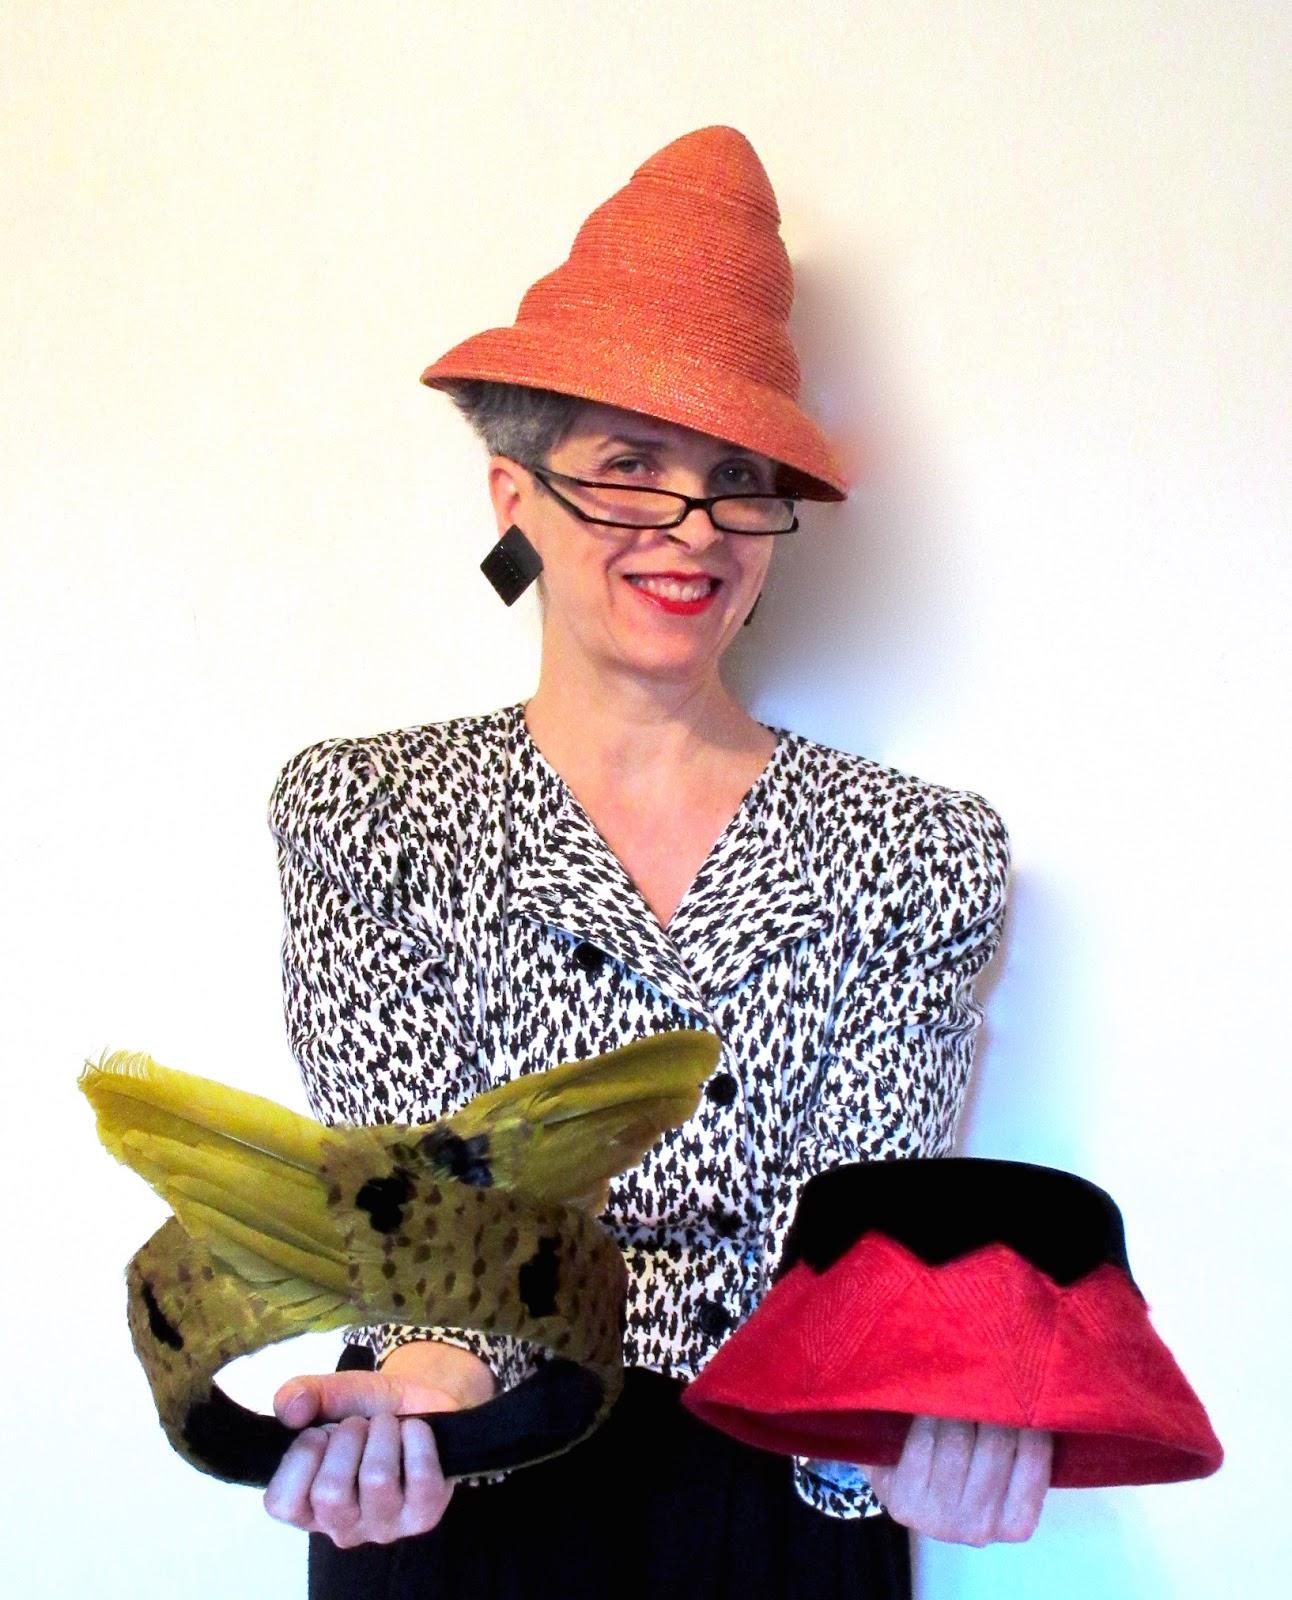 Valerie Idiosyncratic Instagram Tutti: Idiosyncratic Fashionistas: THE HAT CHALLENGE